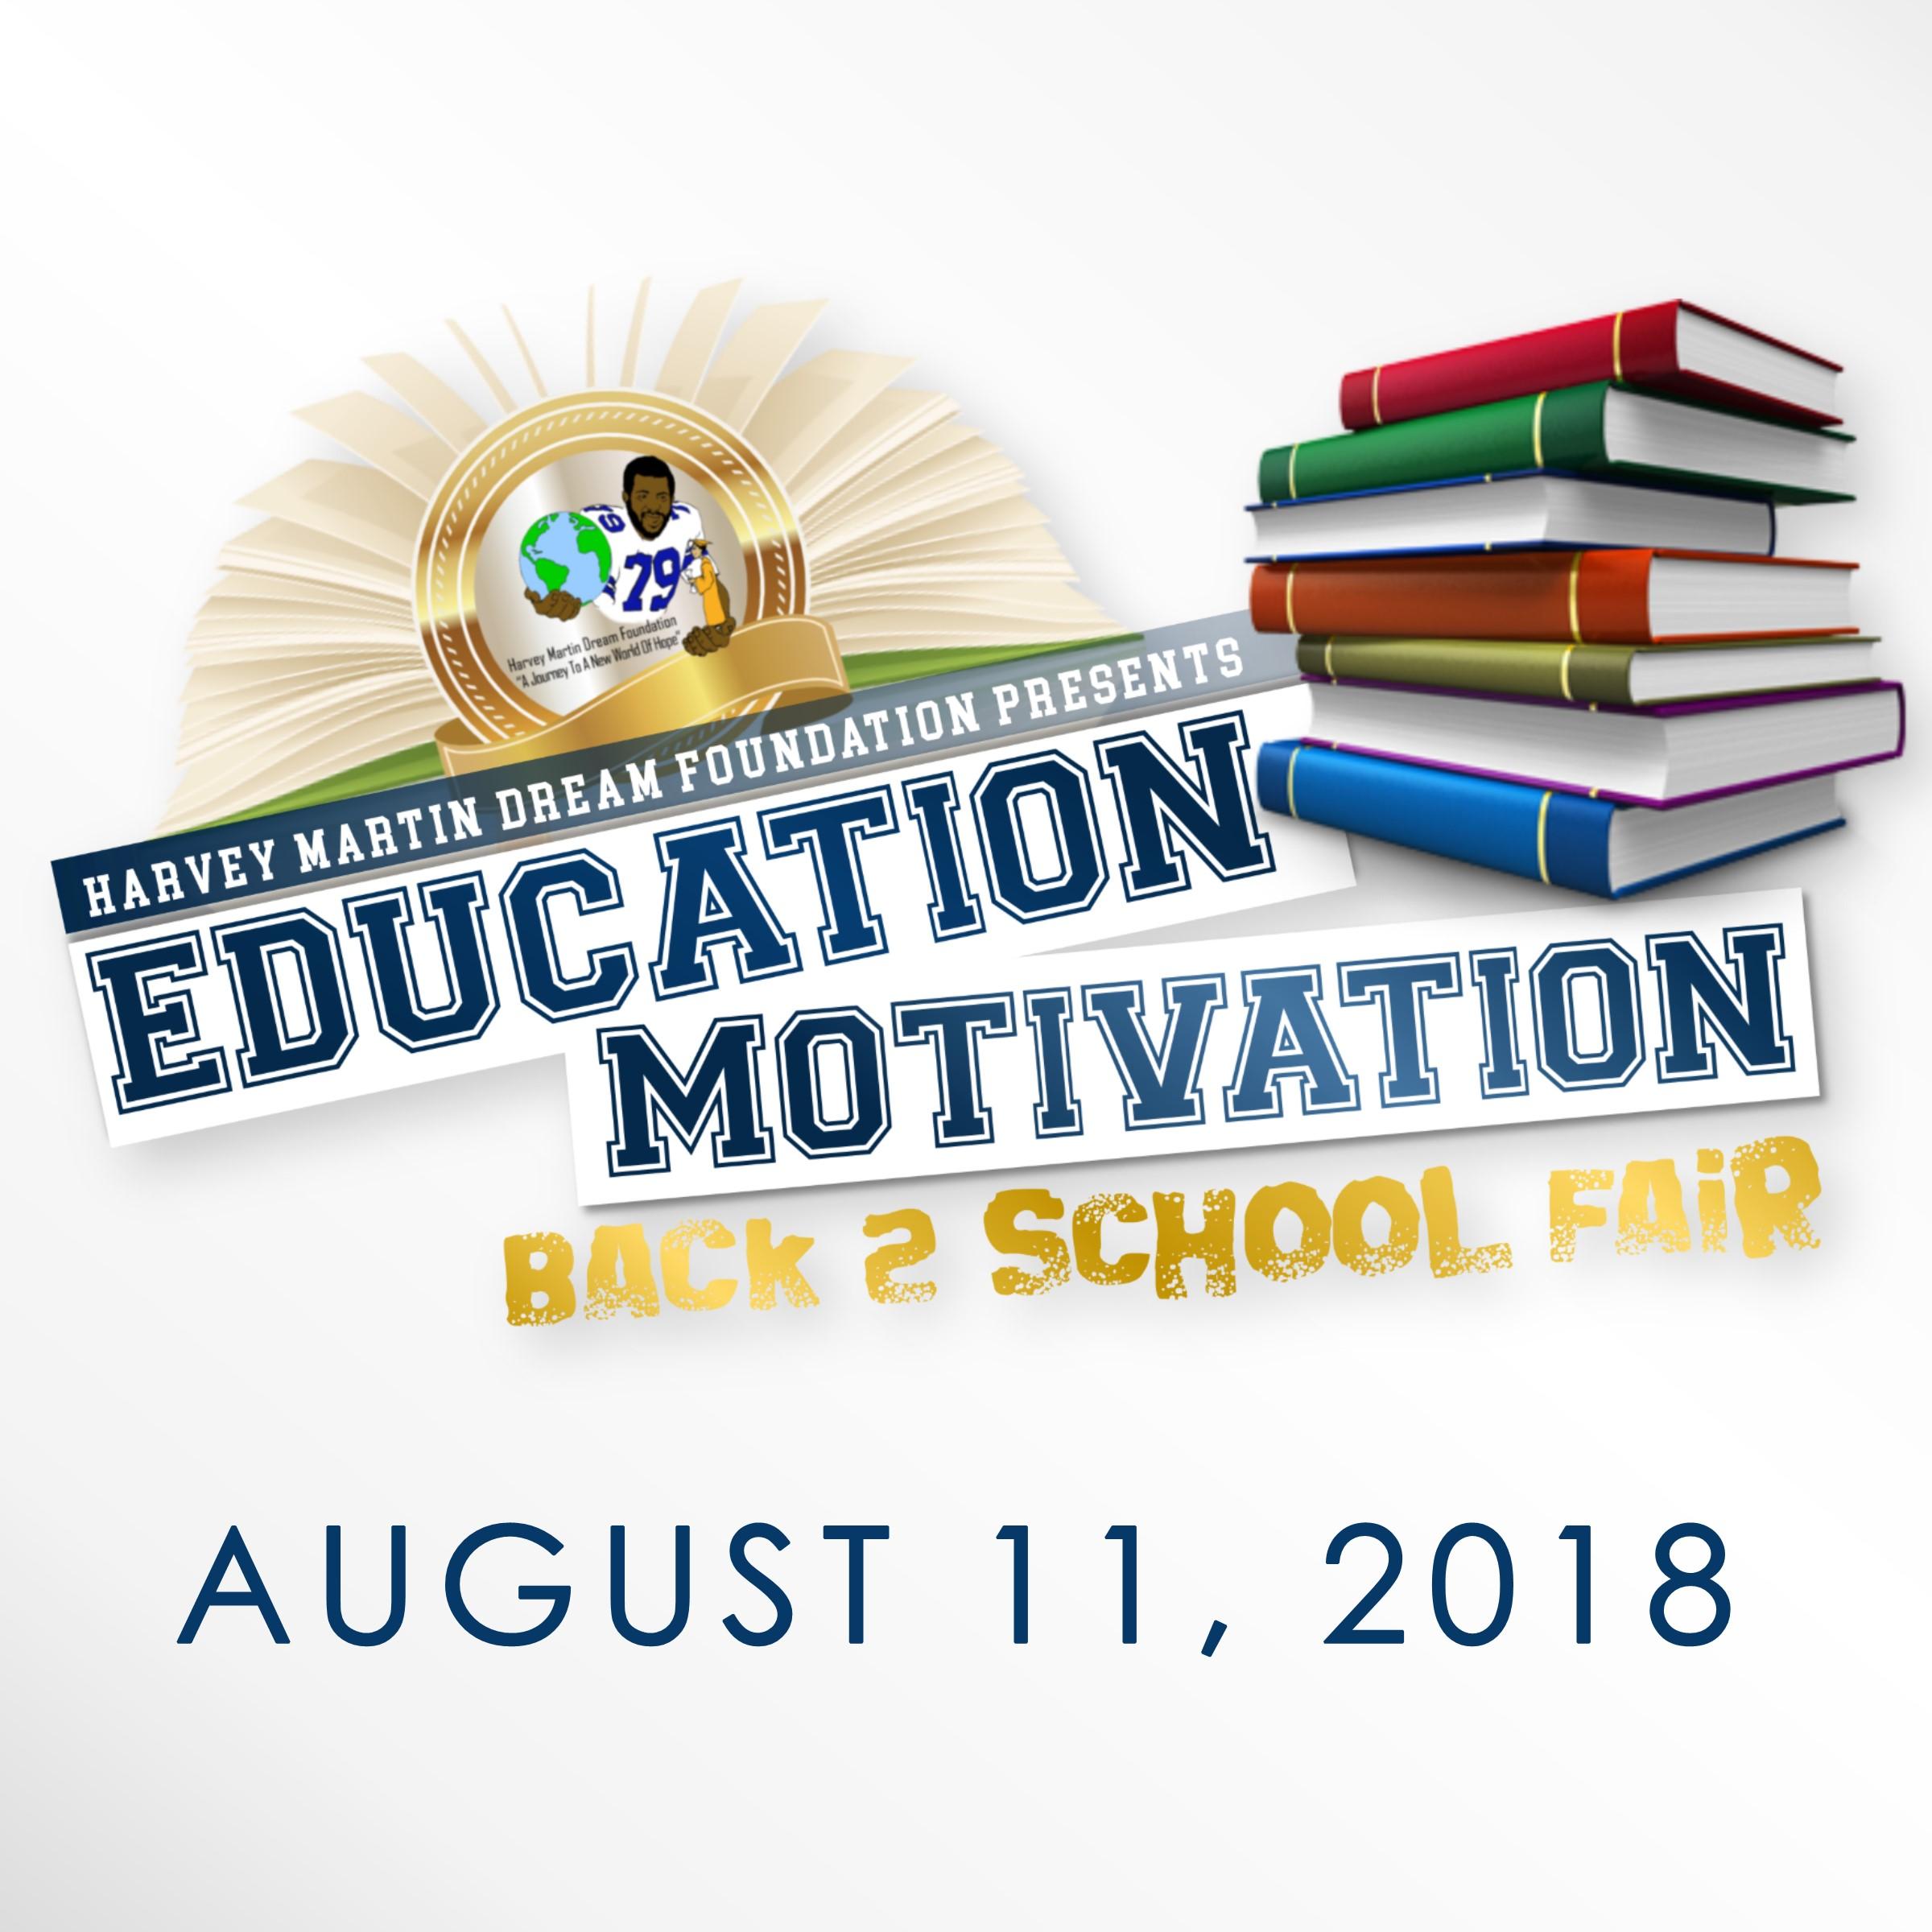 Education Motivation Back 2 School Fair